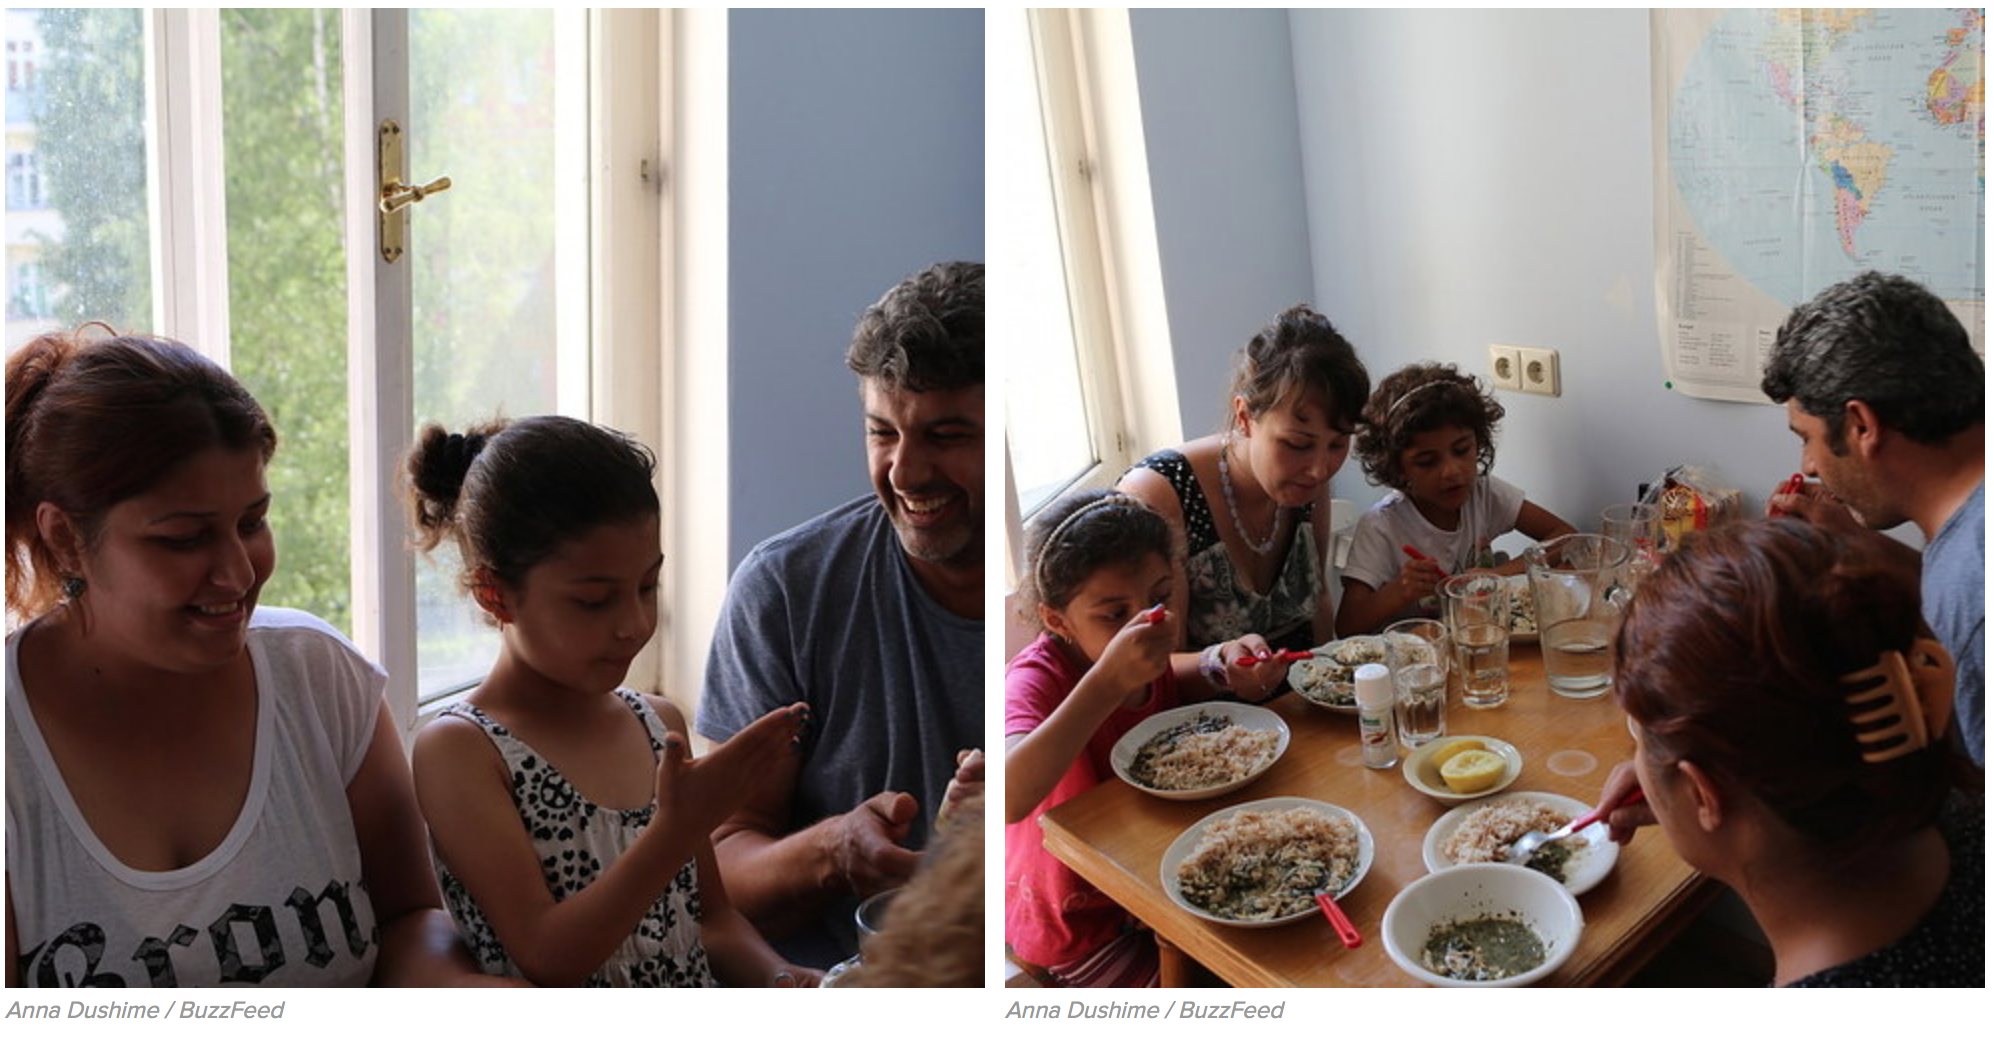 labananequiparle-refugies-syriens-temoignage-hollande-1